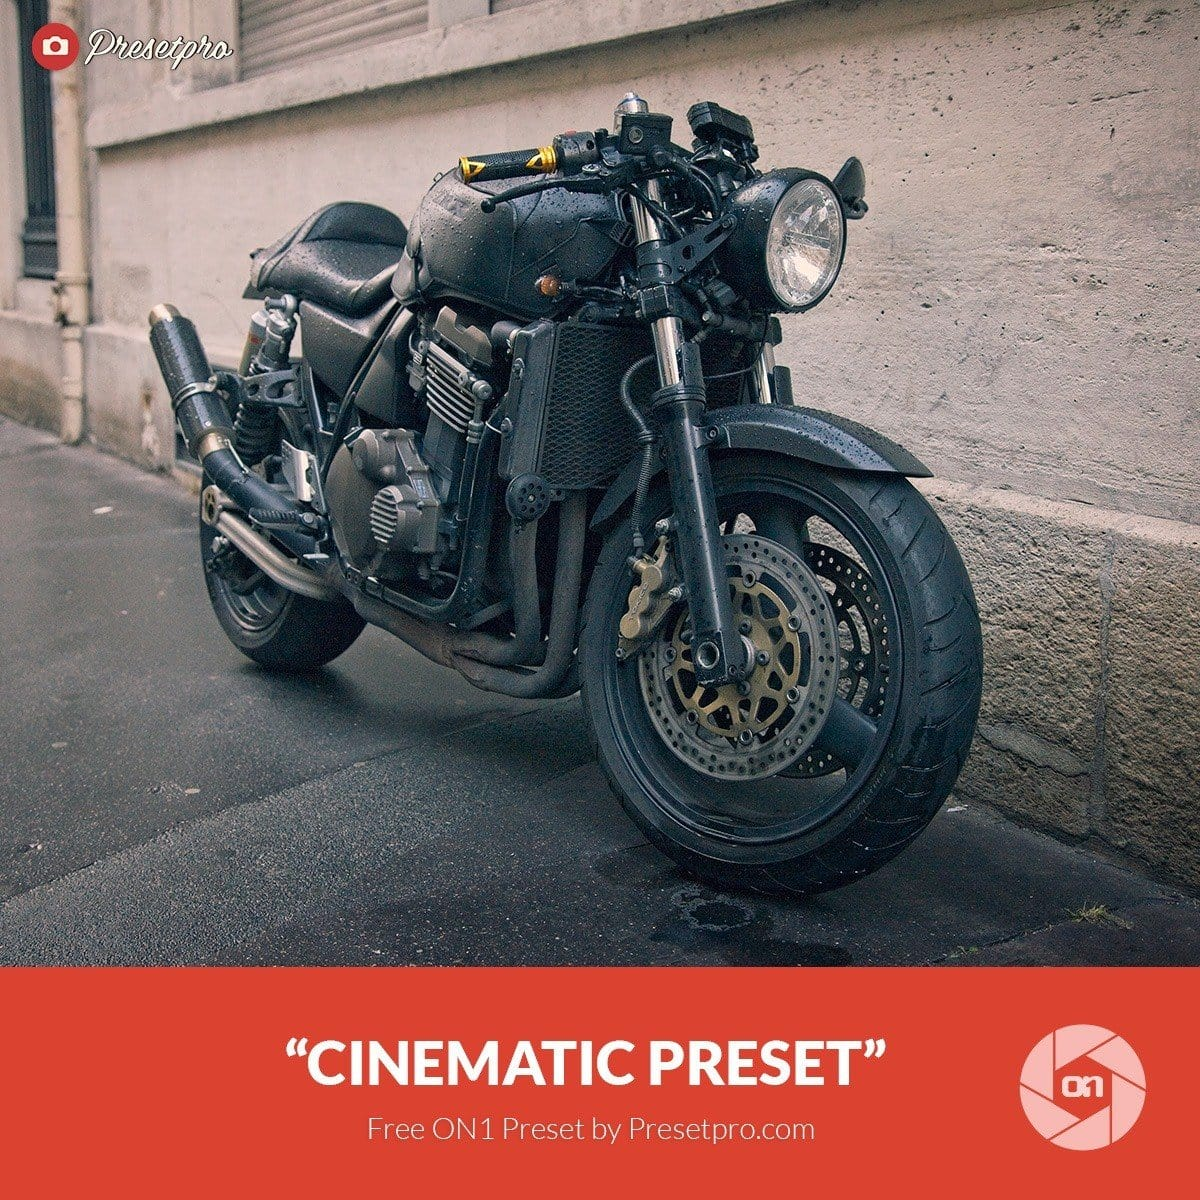 Free-On1-Preset-Cinematic-Presetpro.com